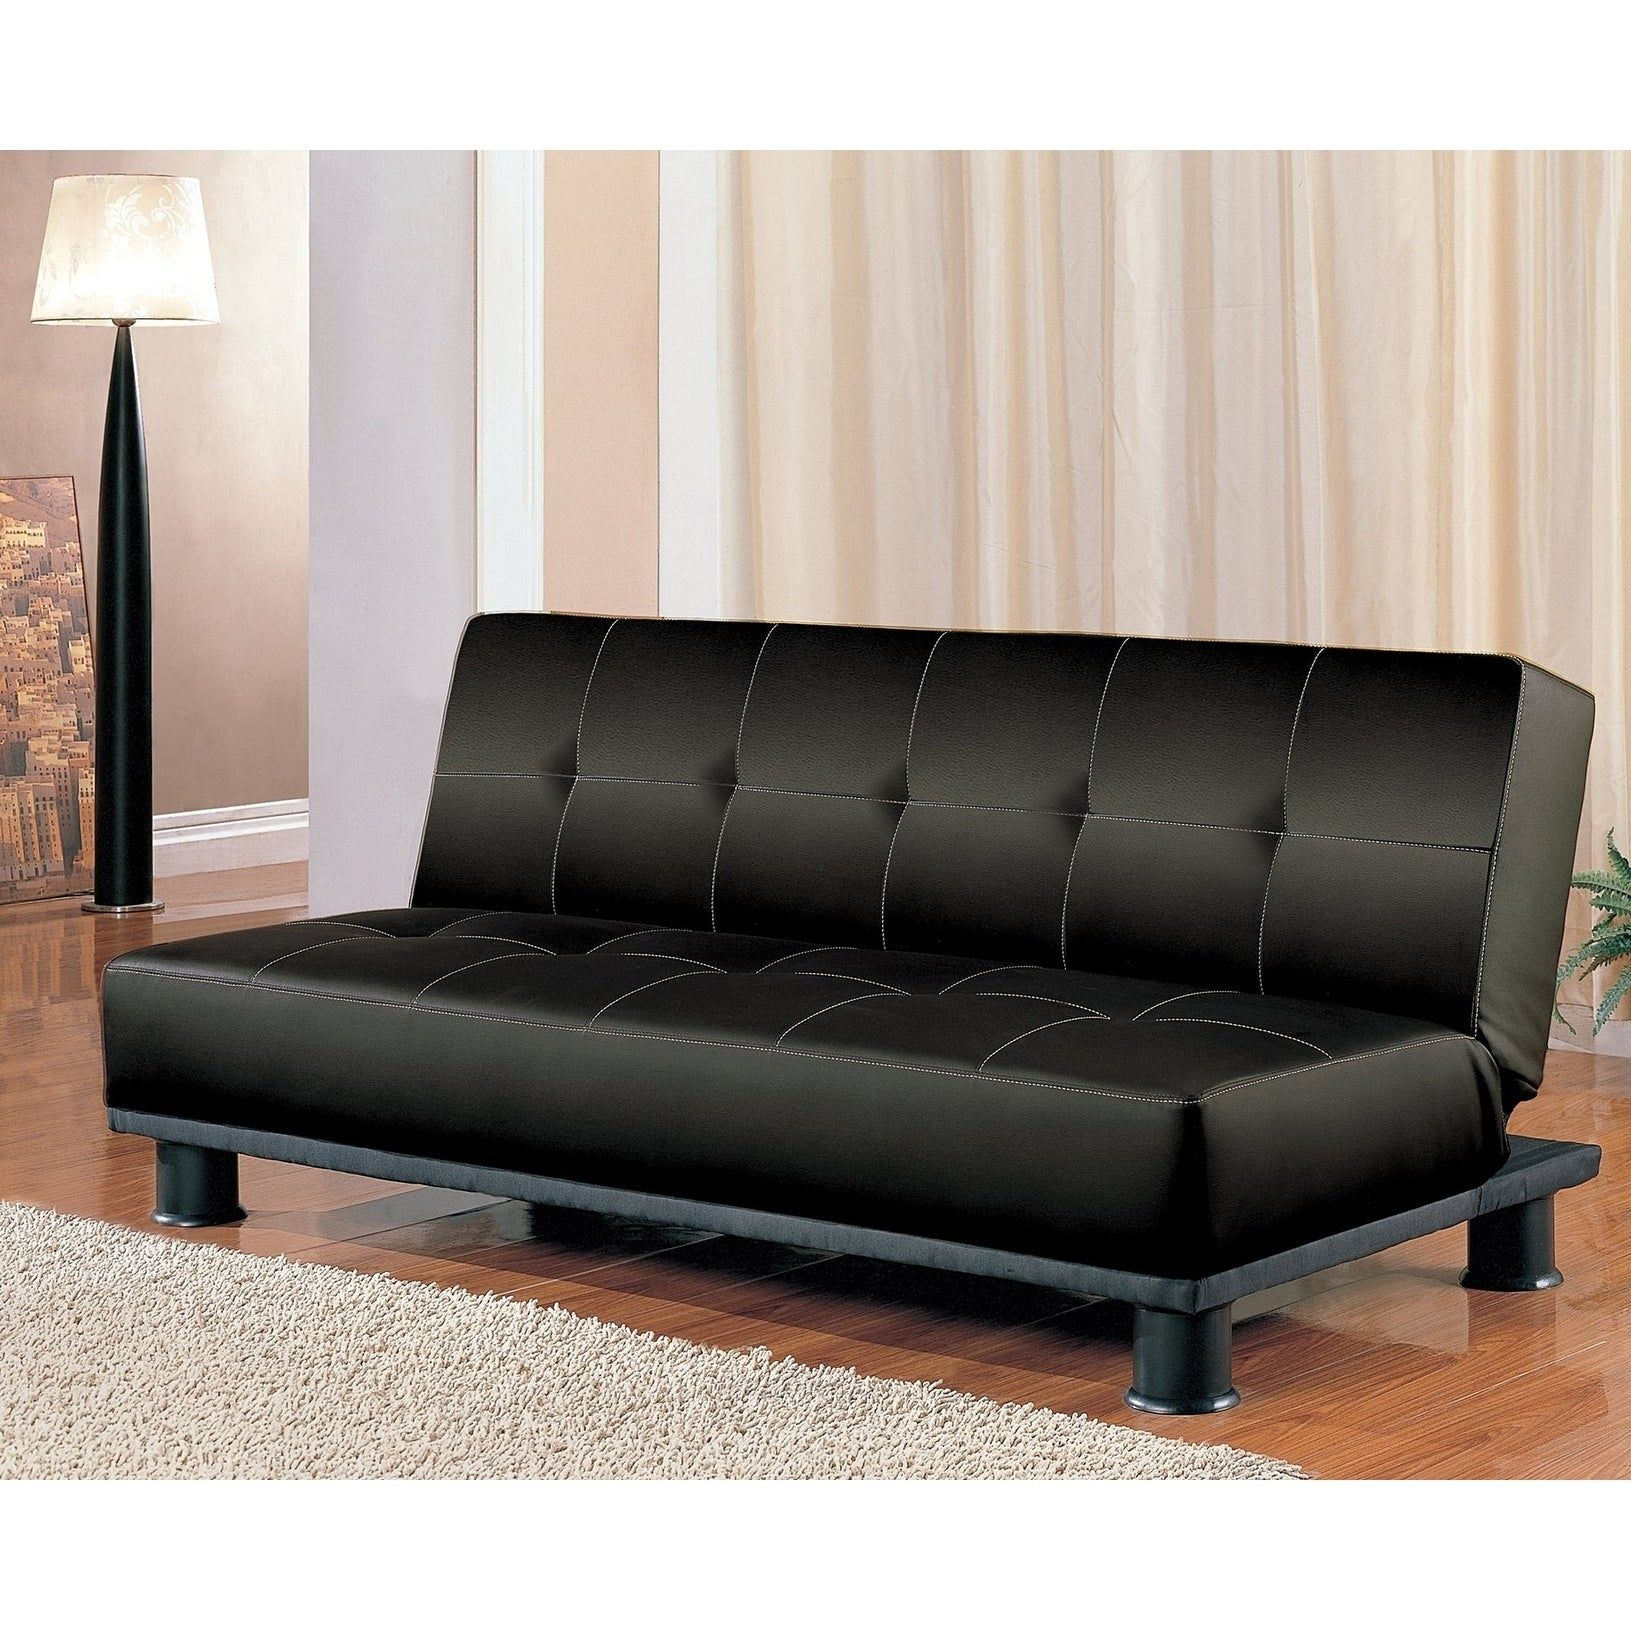 Antonio Black Leather Convertible Sofa